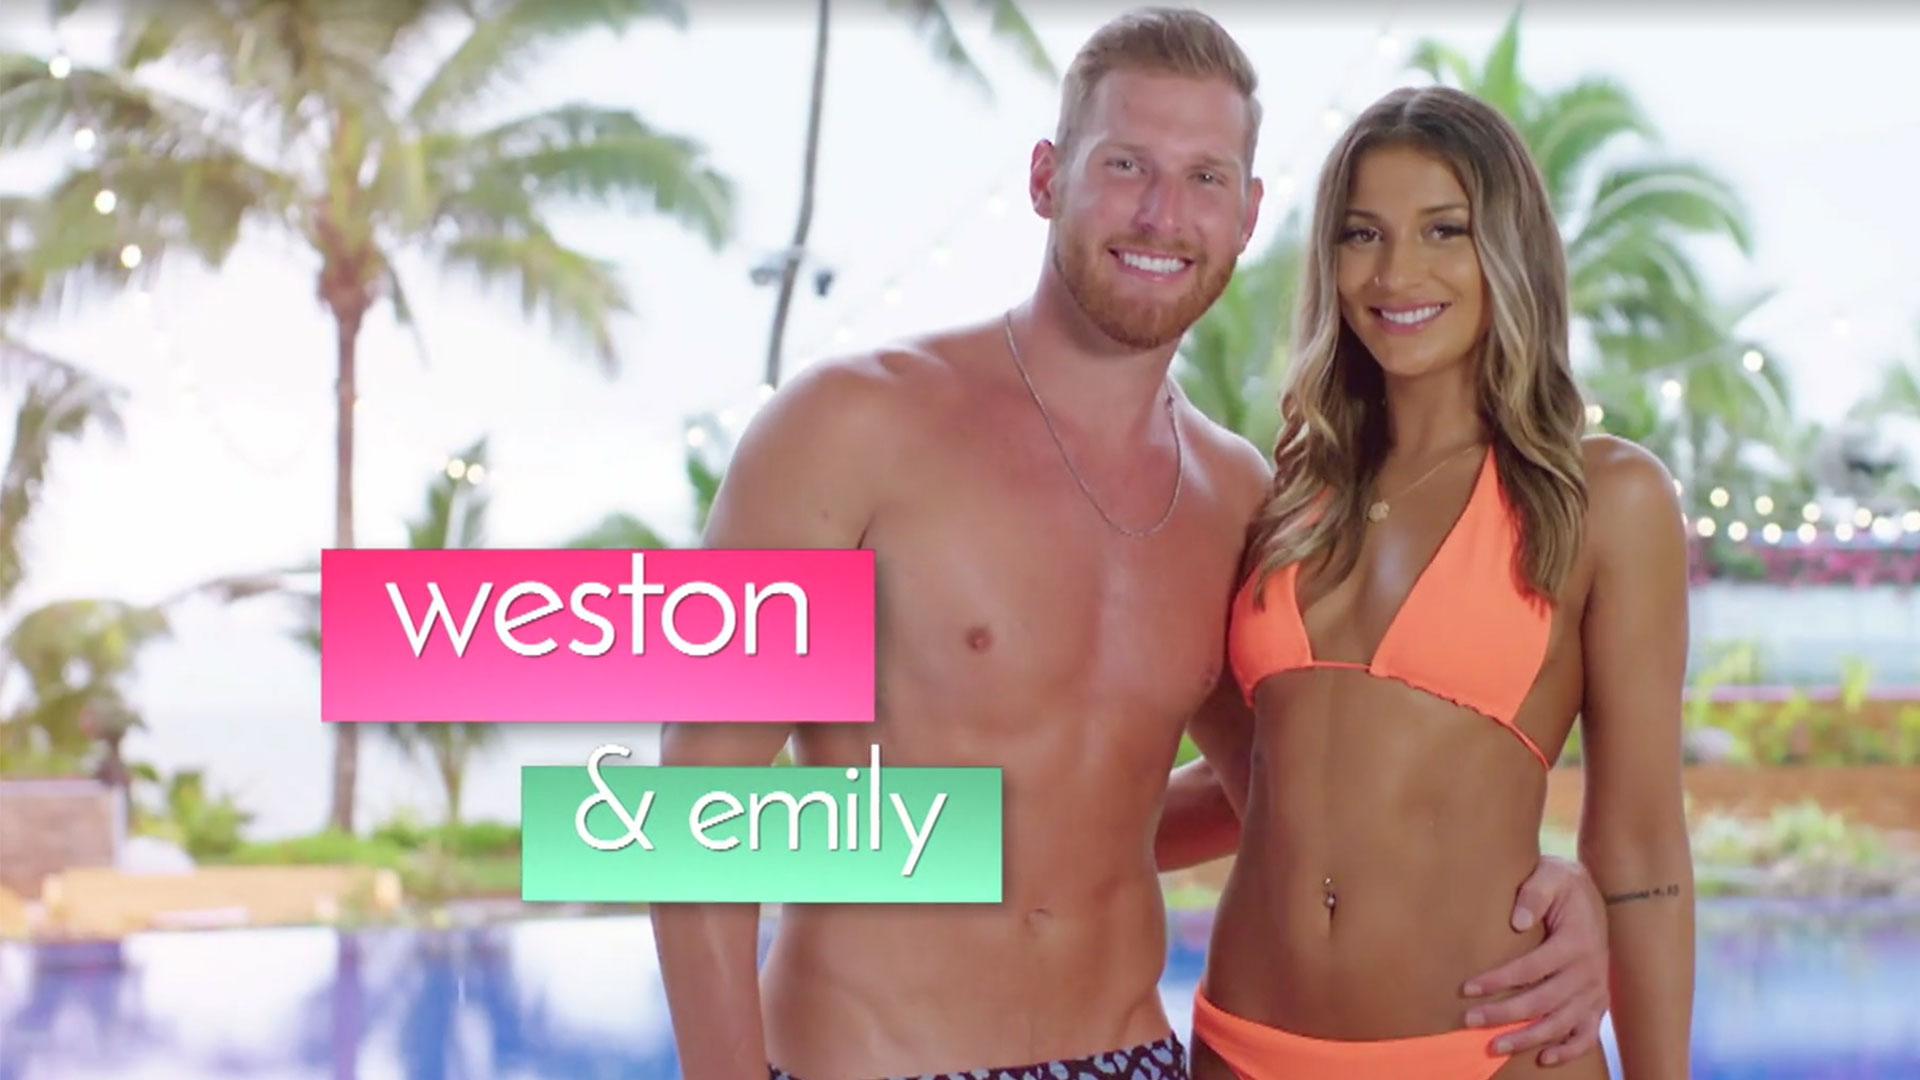 Weston and Emily